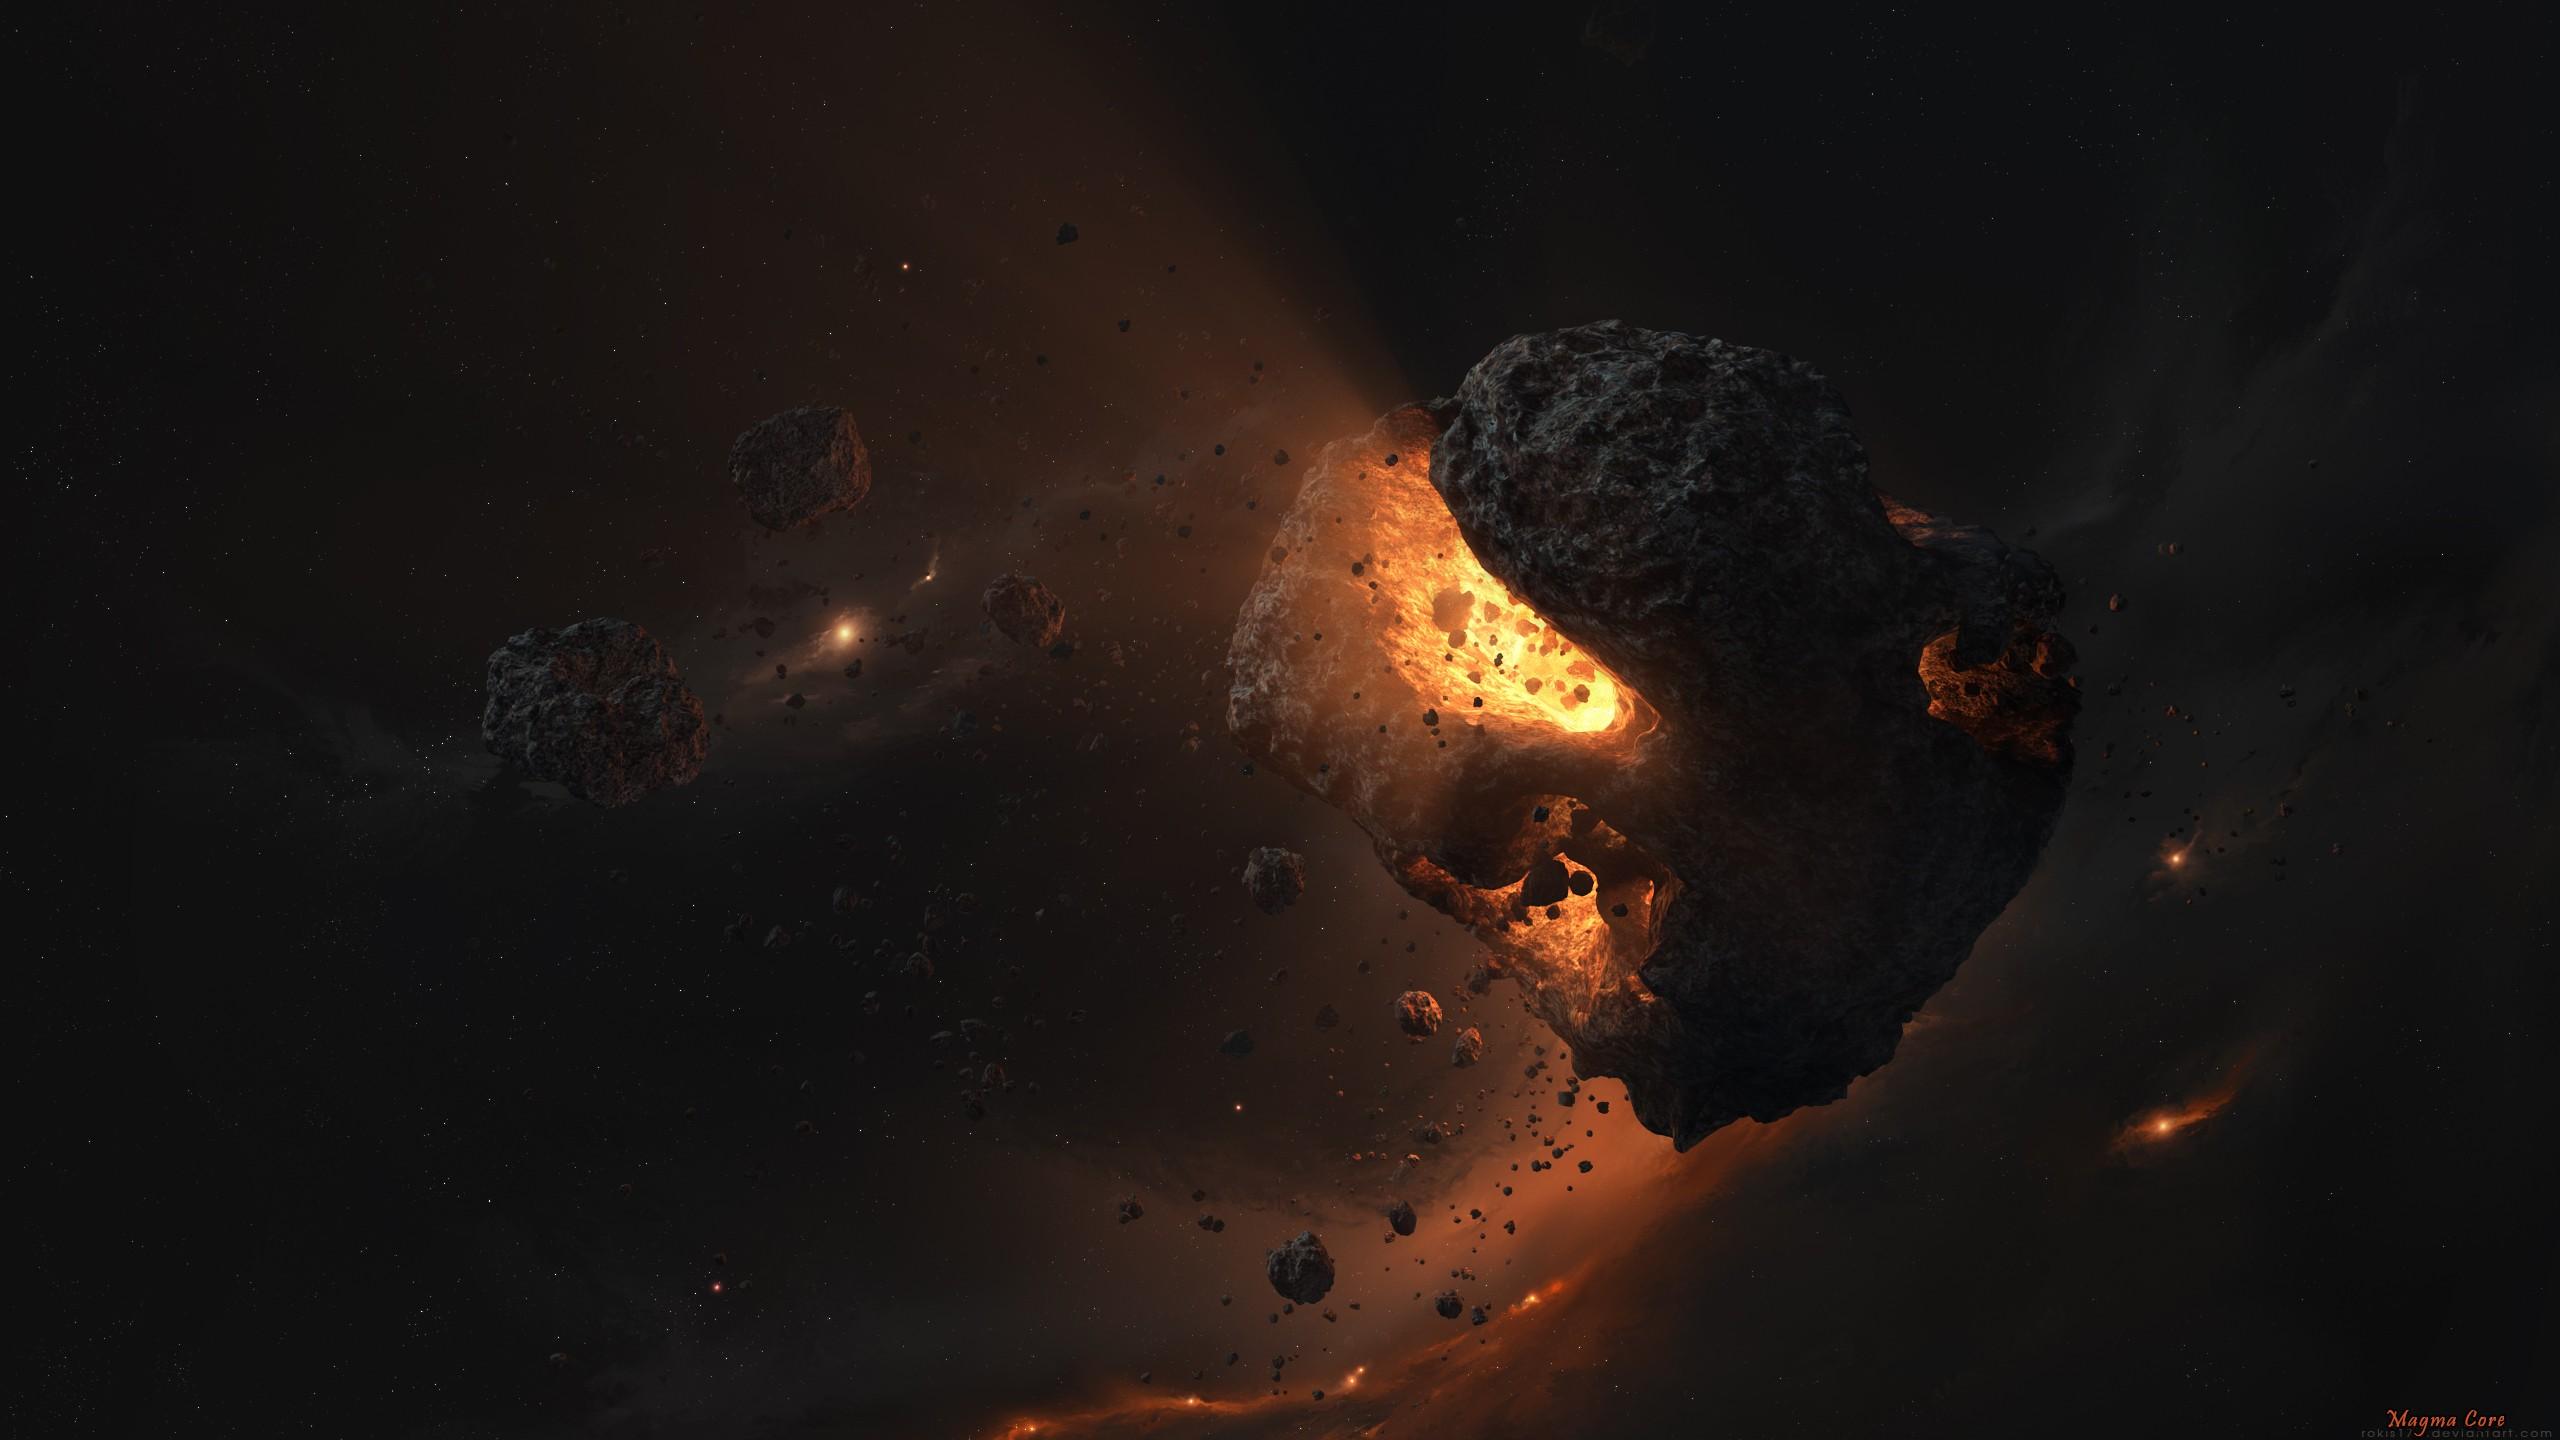 General 2560x1440 fantasy art digital art artwork science fiction planet asteroid lights